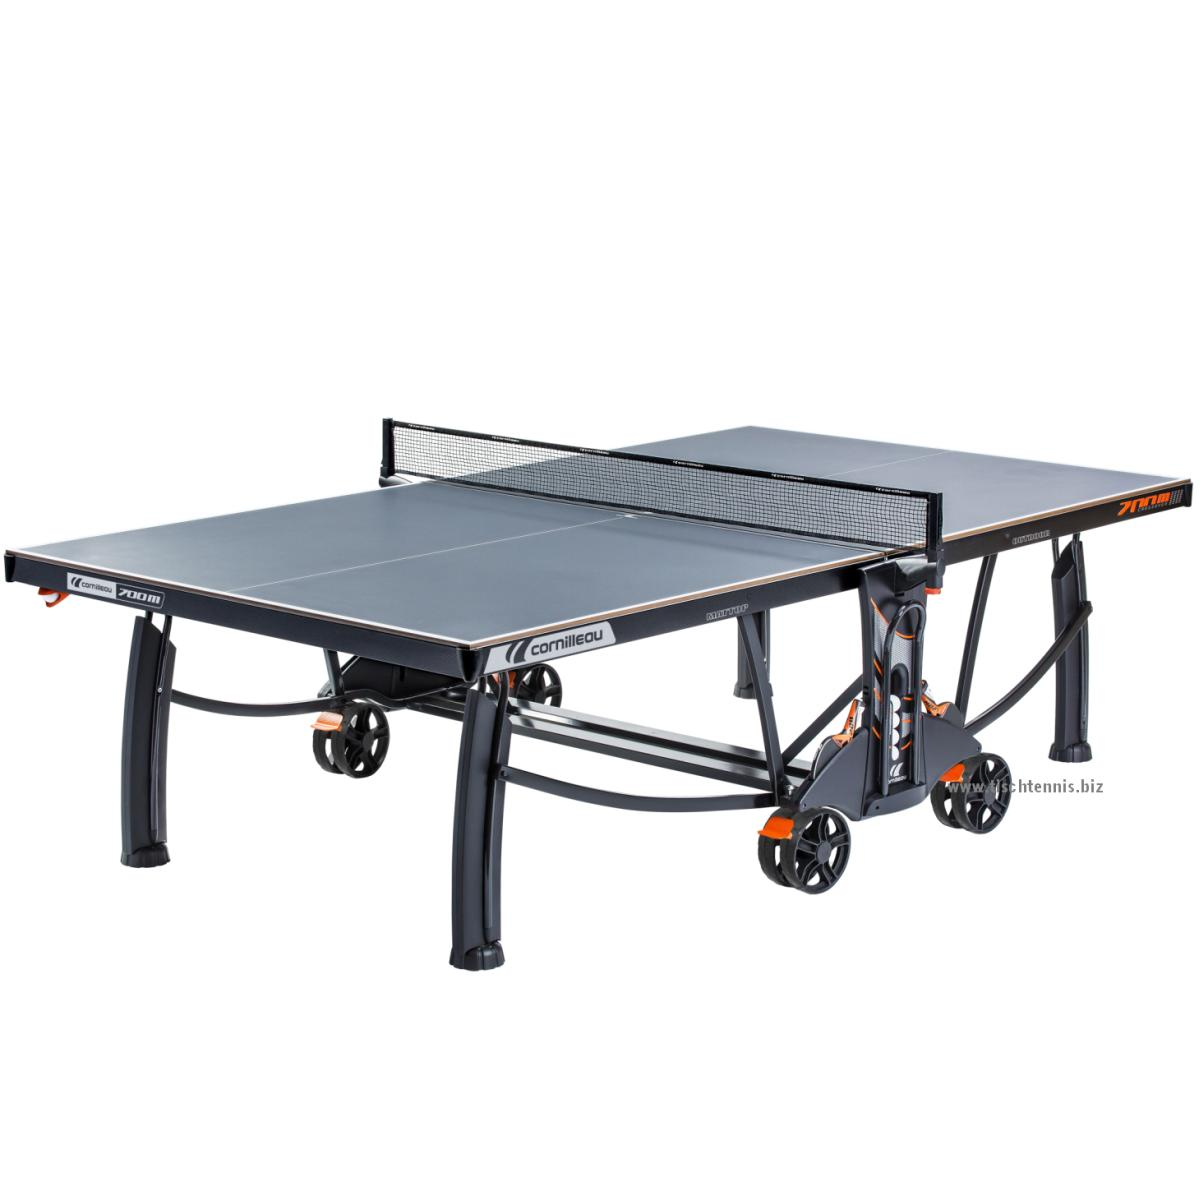 cornilleau 700 m crossover outdoor tischtennisplatte. Black Bedroom Furniture Sets. Home Design Ideas